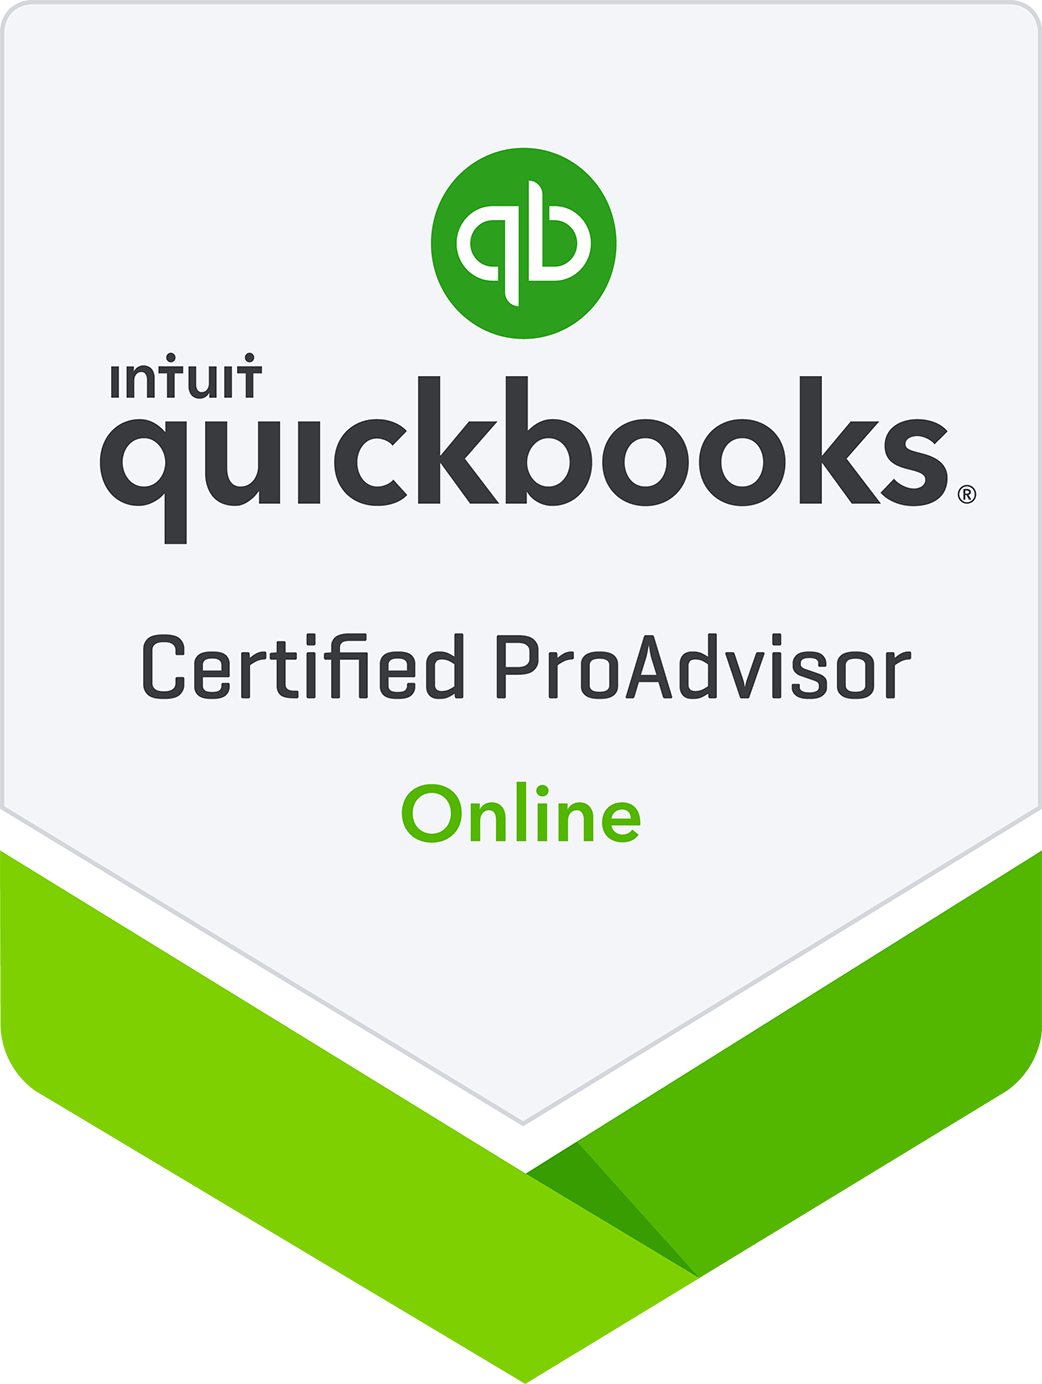 intuit quickbooks certified pro advisor online logo